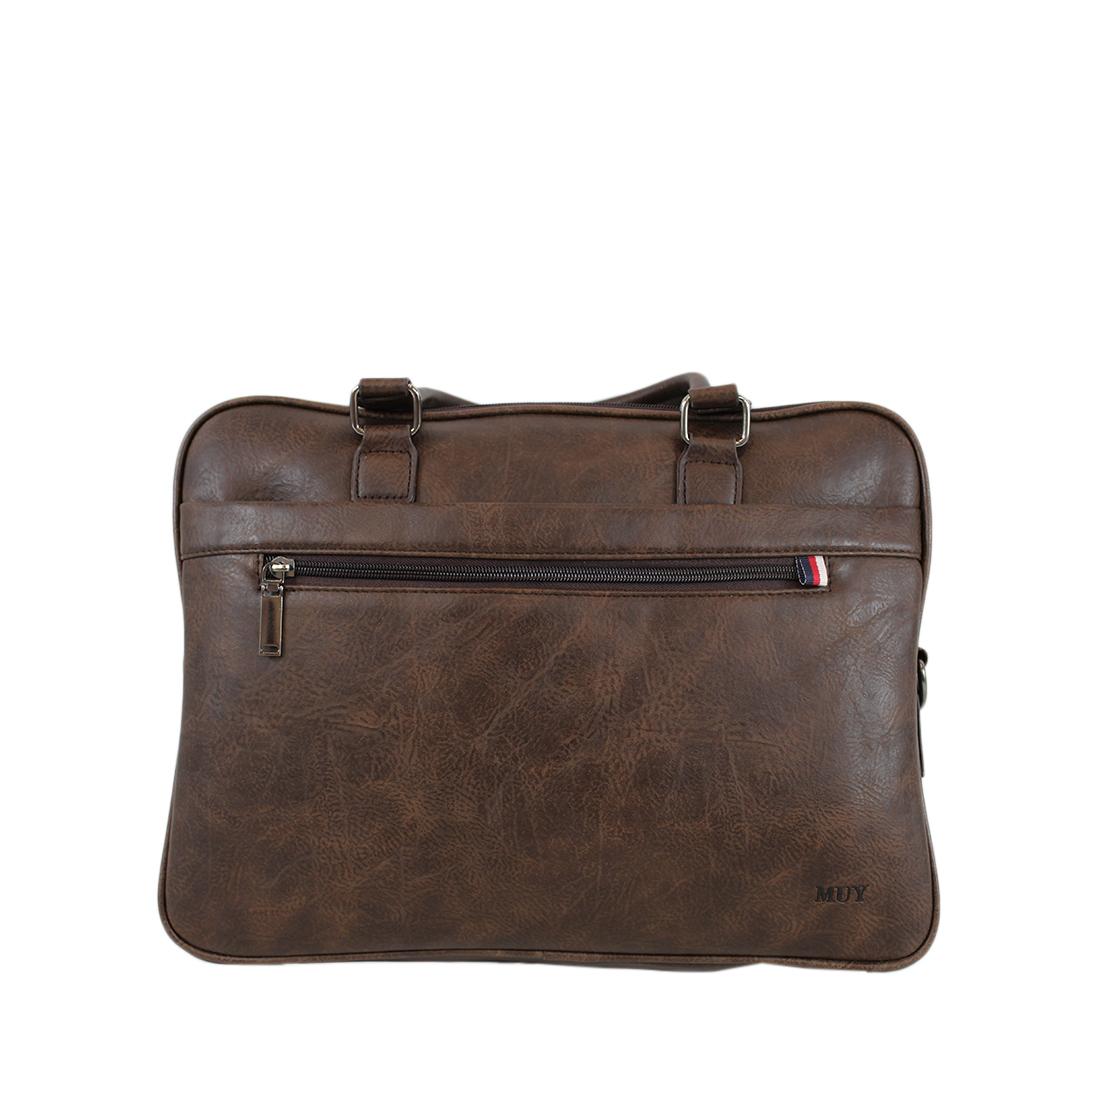 Classic leather briefcase laptop handbag